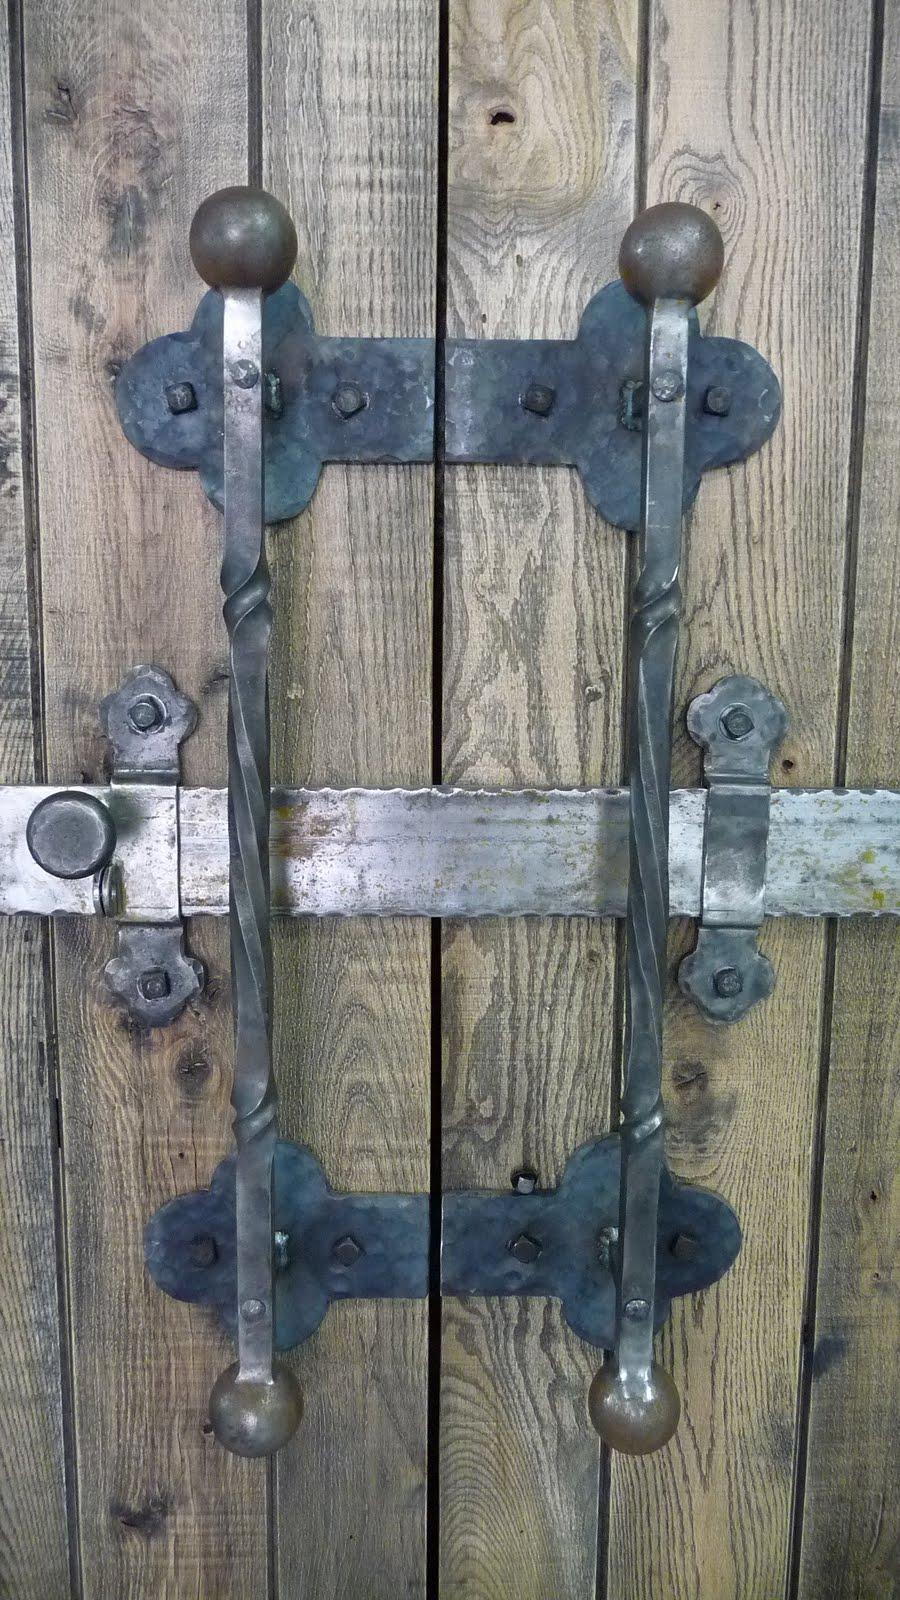 Living Iron Barn Door Pulls And Slide Lock